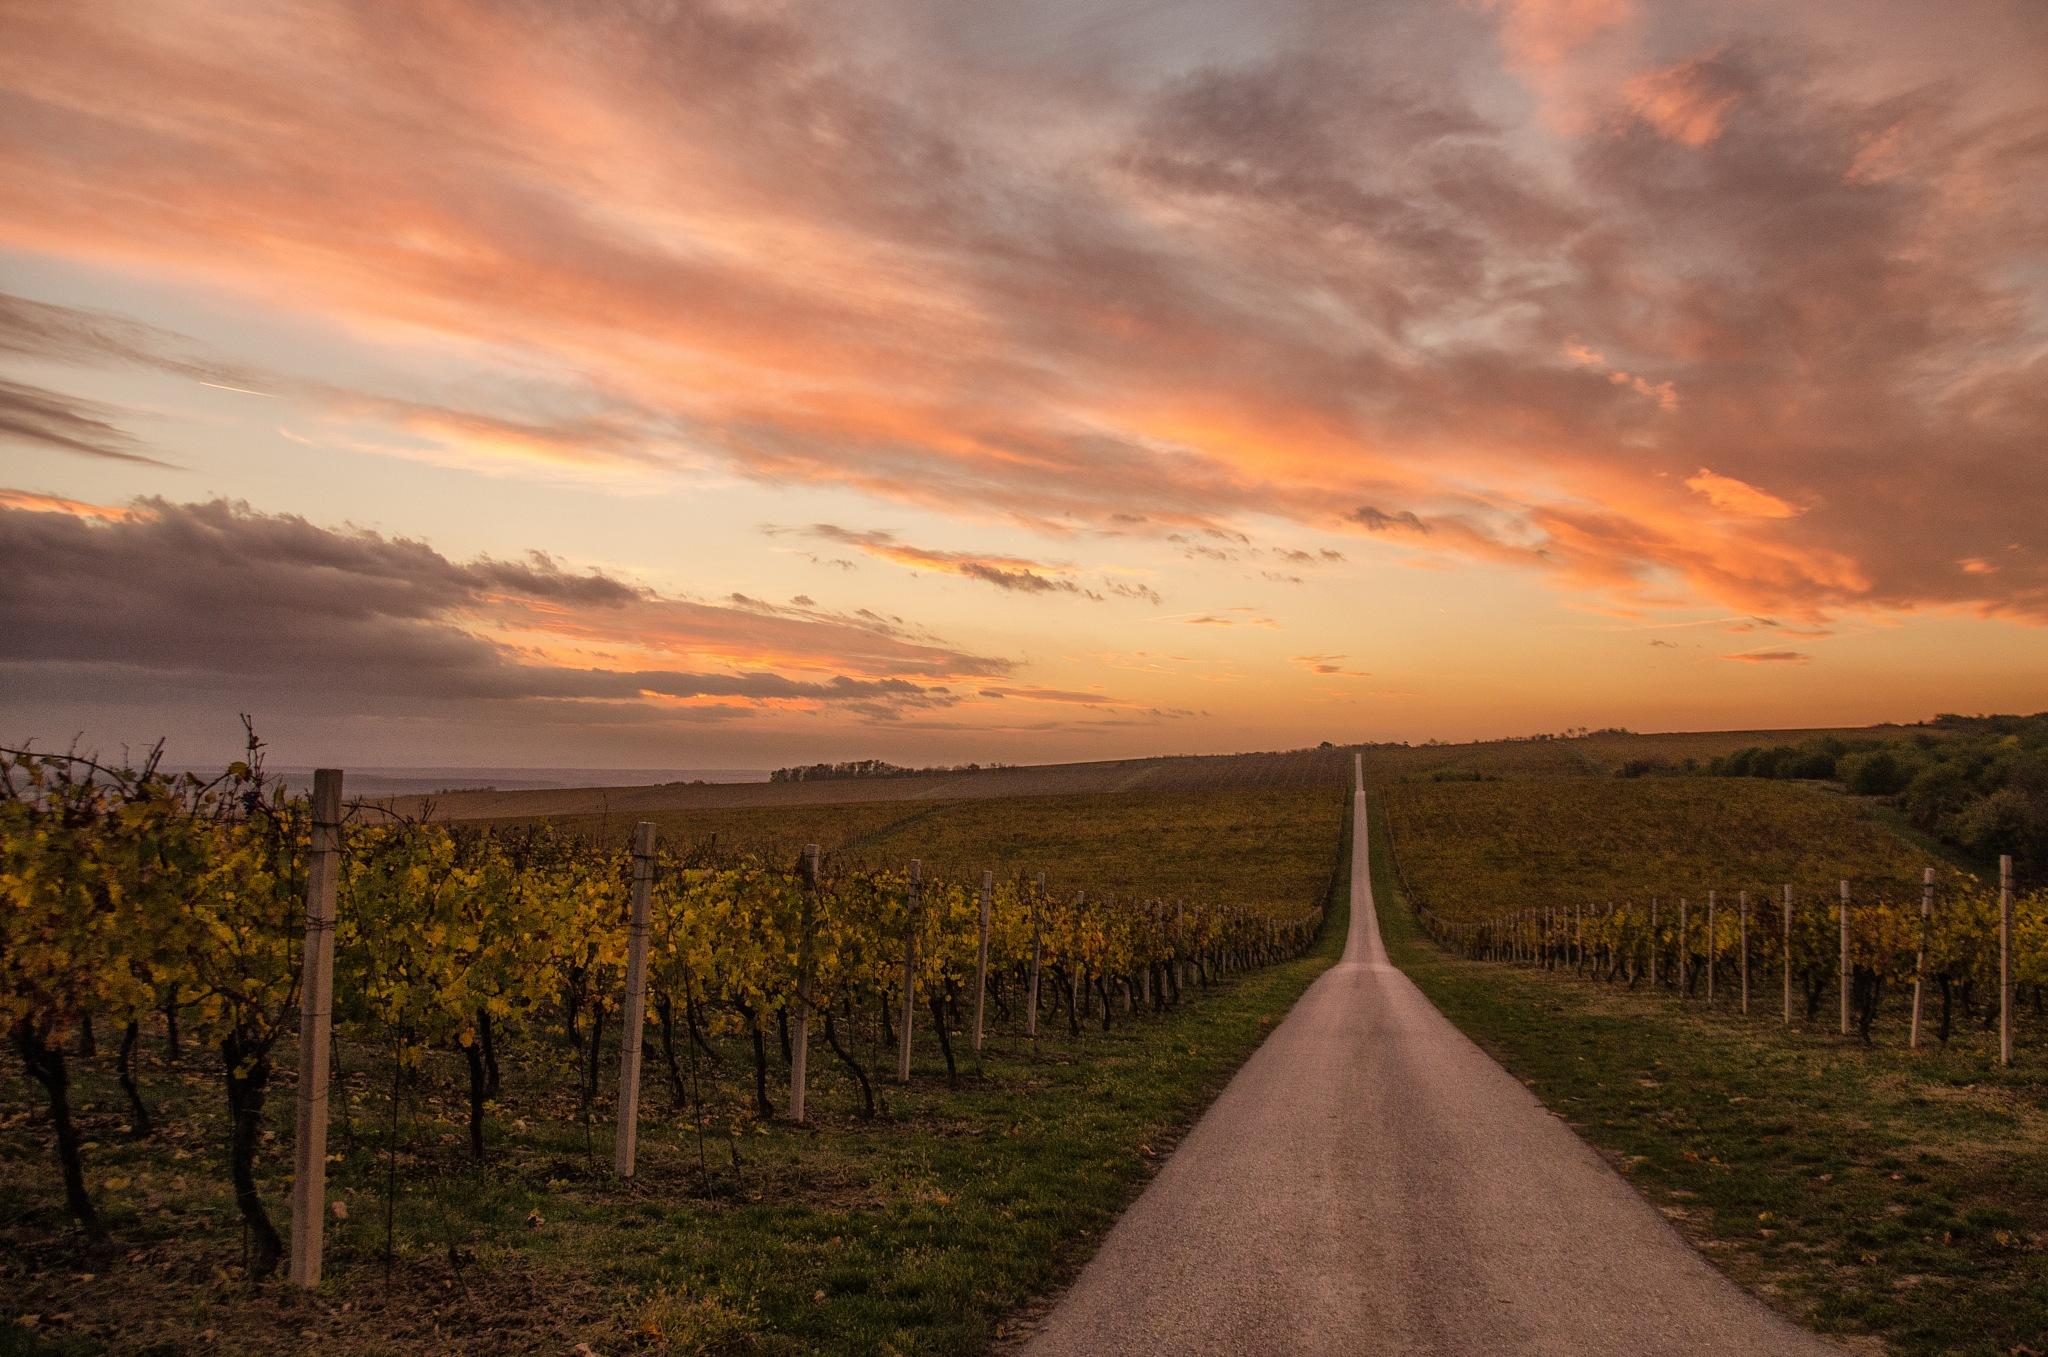 Gold vineyards of Baranja by Nenad Milic